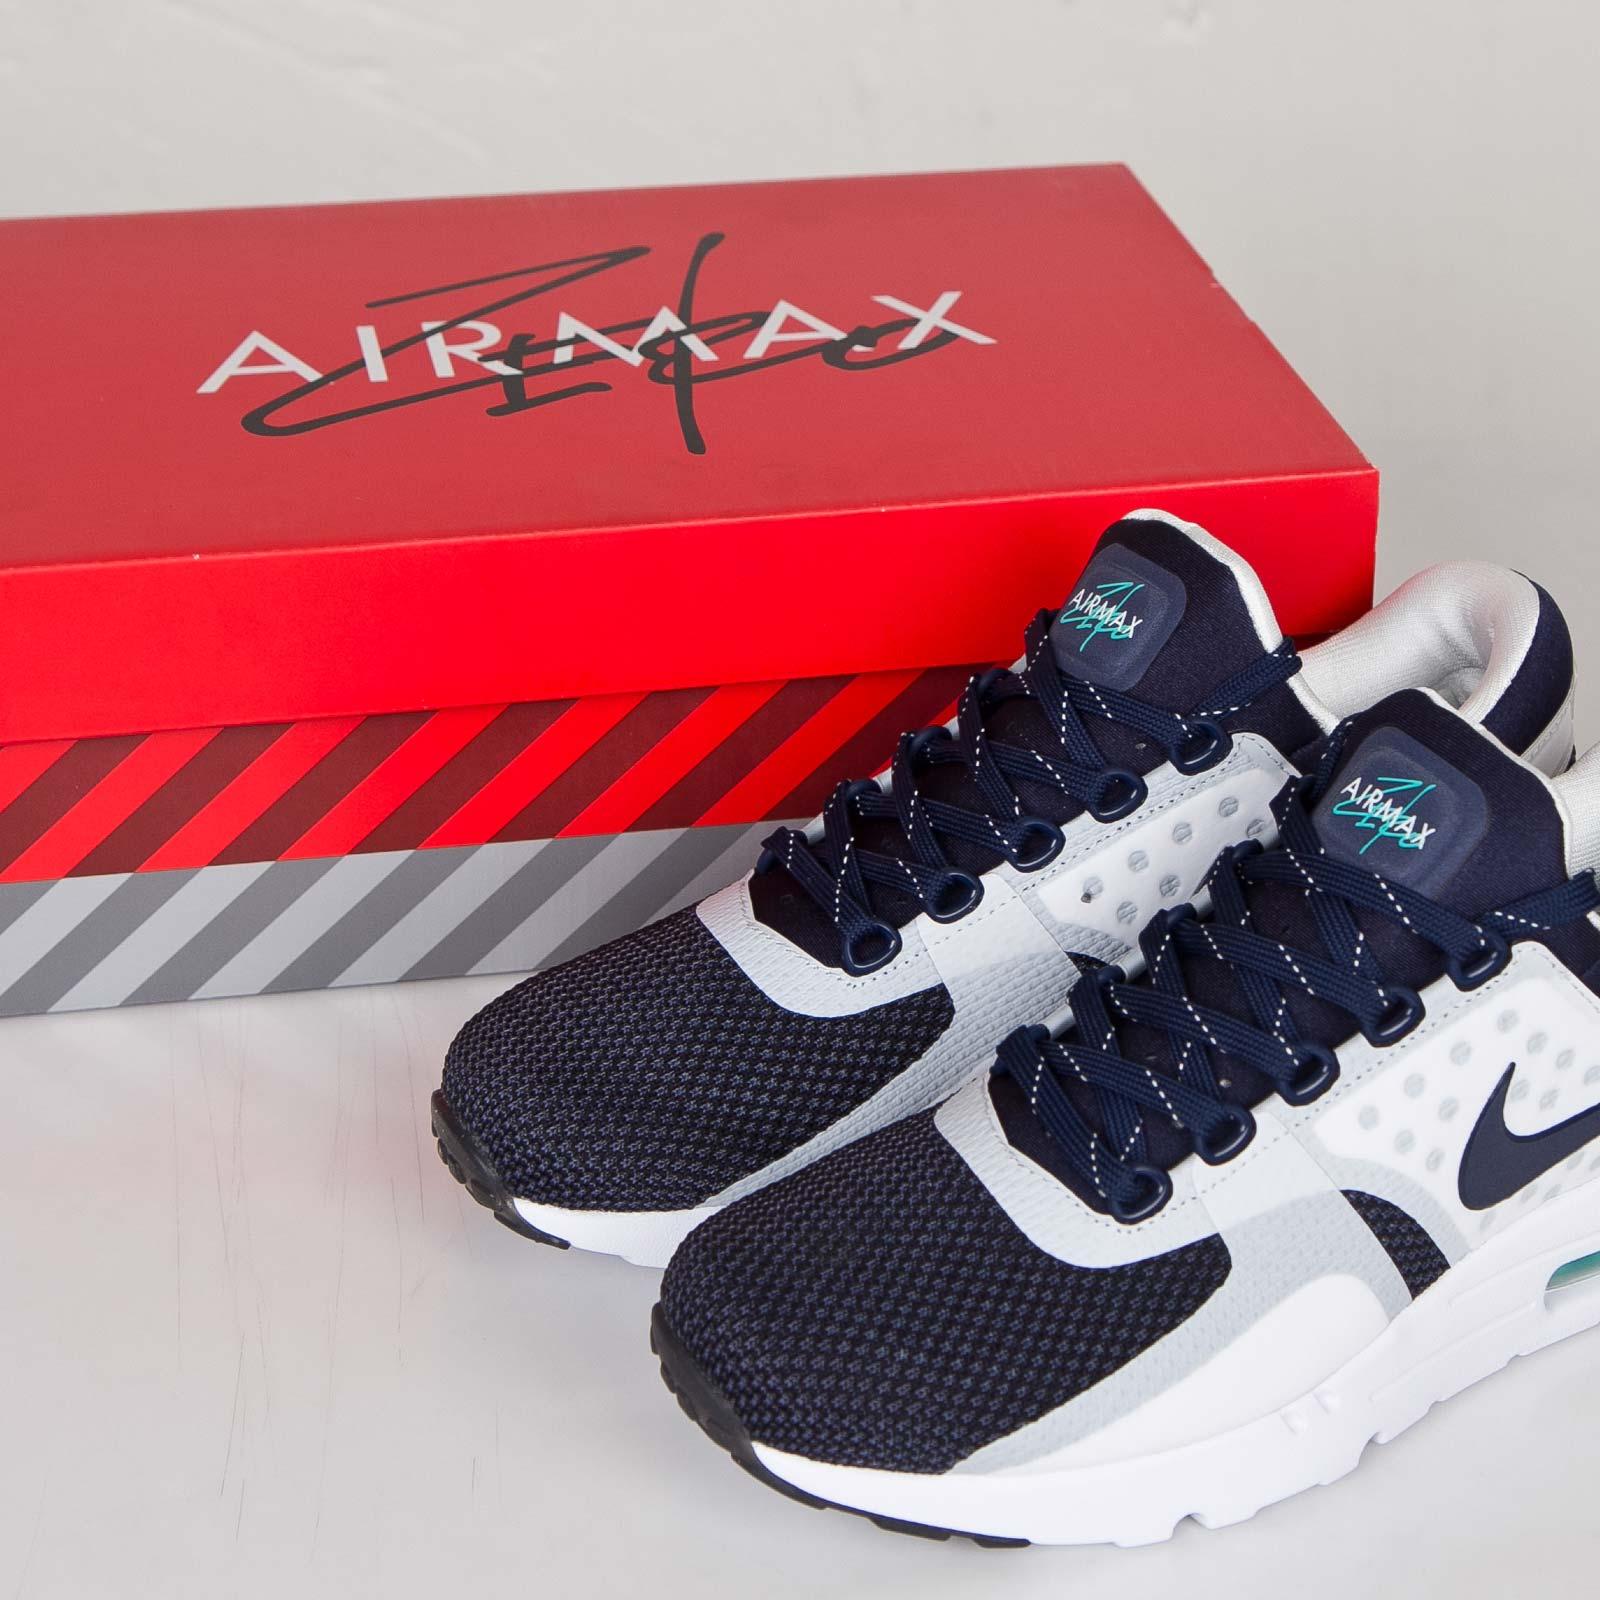 best loved 0fd97 41a13 Nike Air Max Zero QS - 789695-104 - Sneakersnstuff ...